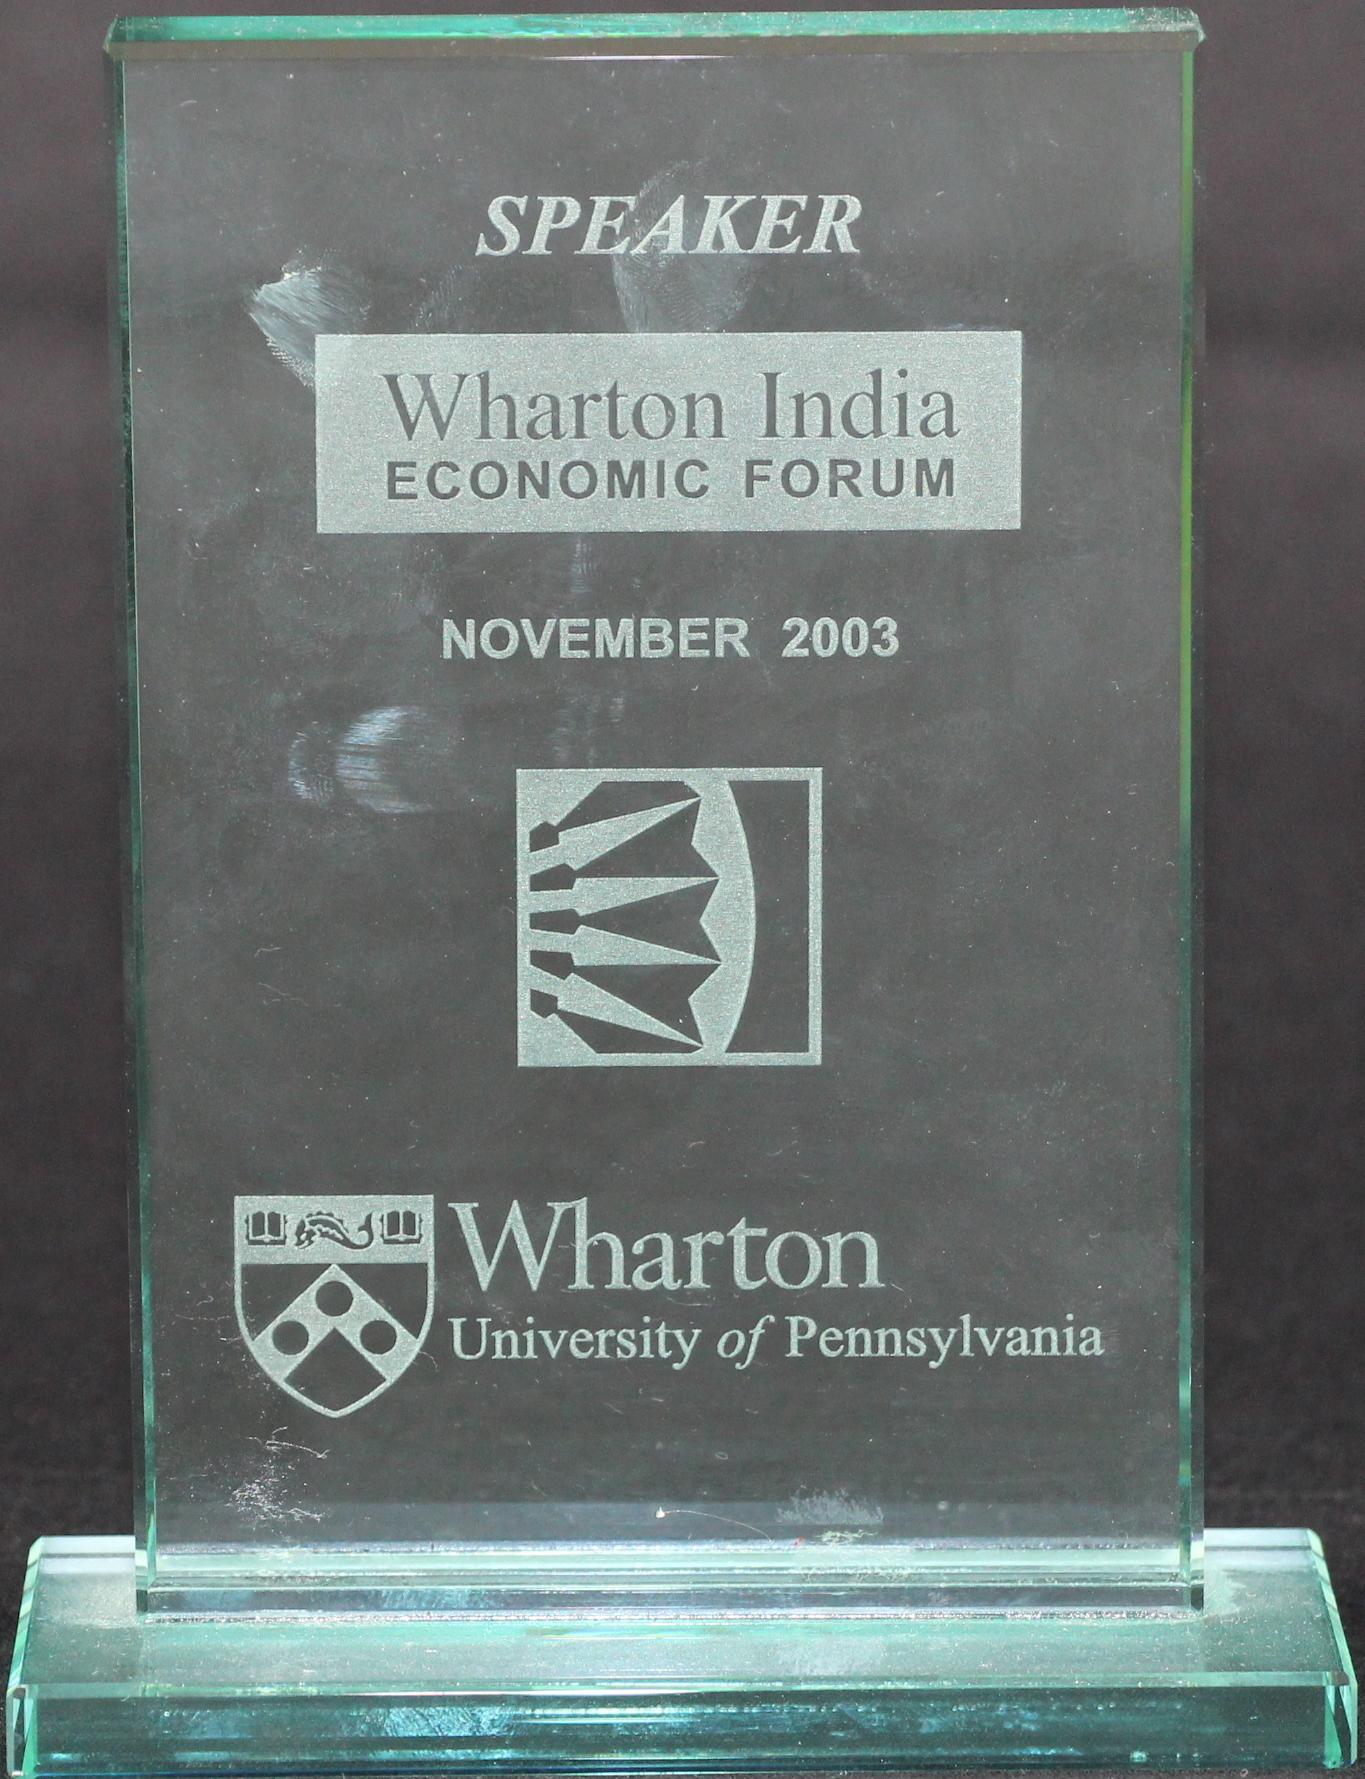 Wharton Indian Economic Forum Speaker Award, University of Pennsylvania Wharton School, 2003